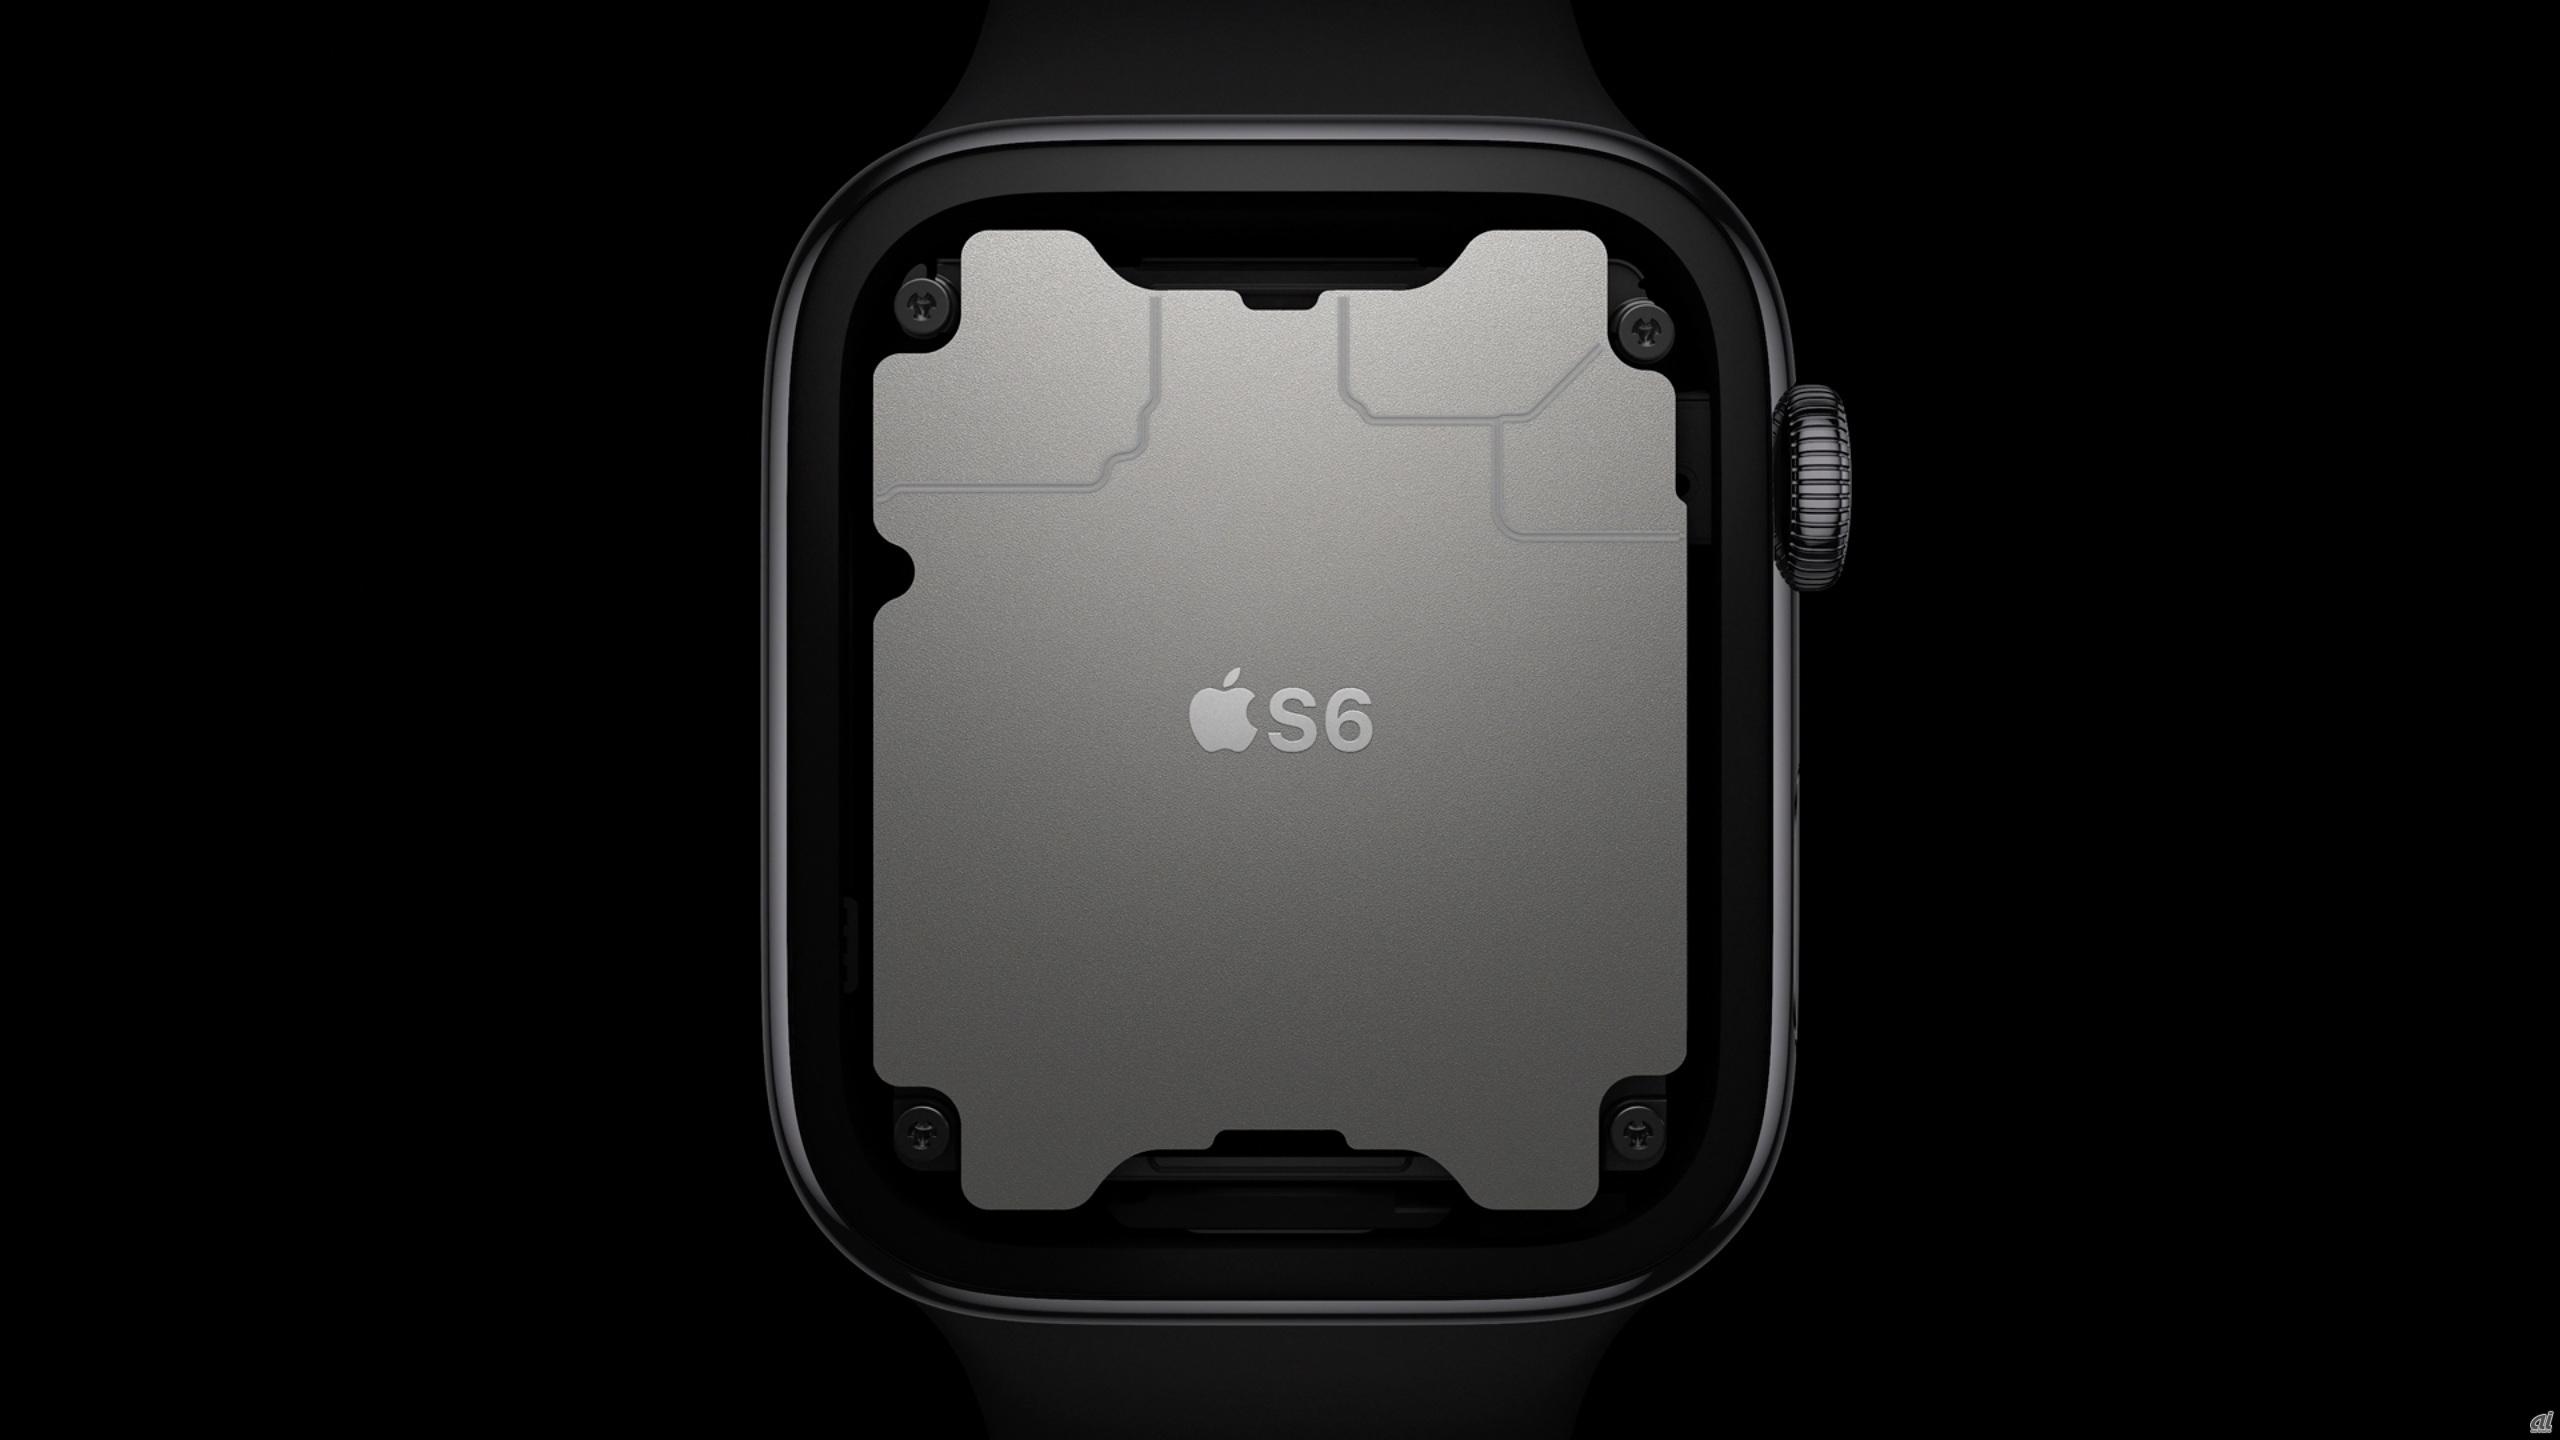 「S6」プロセッサを搭載